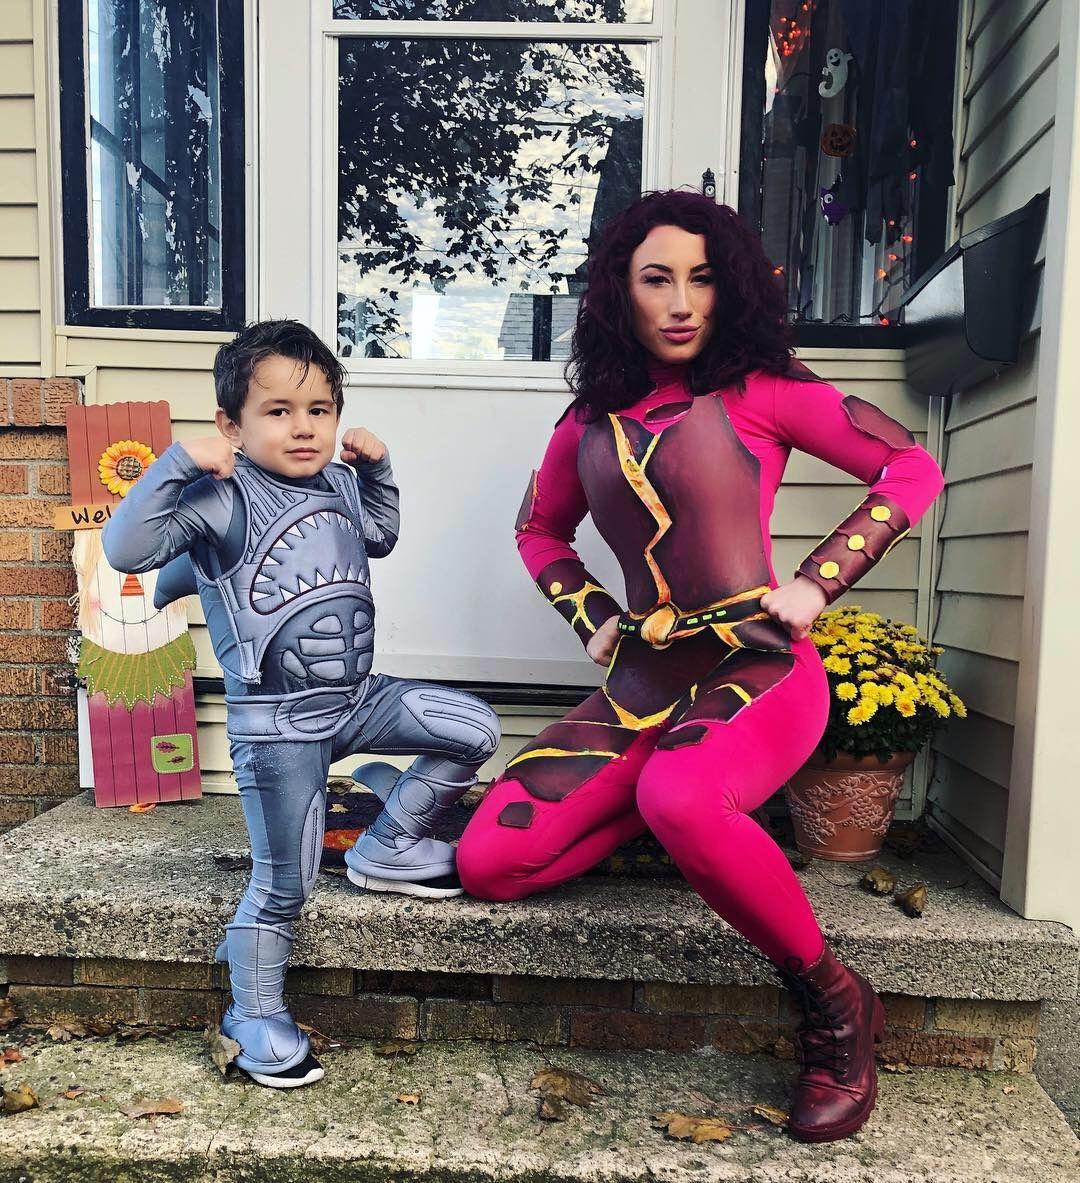 Halloween 2020 Son Sharkboy and Lavagirl | Mom halloween costumes, Mom costumes